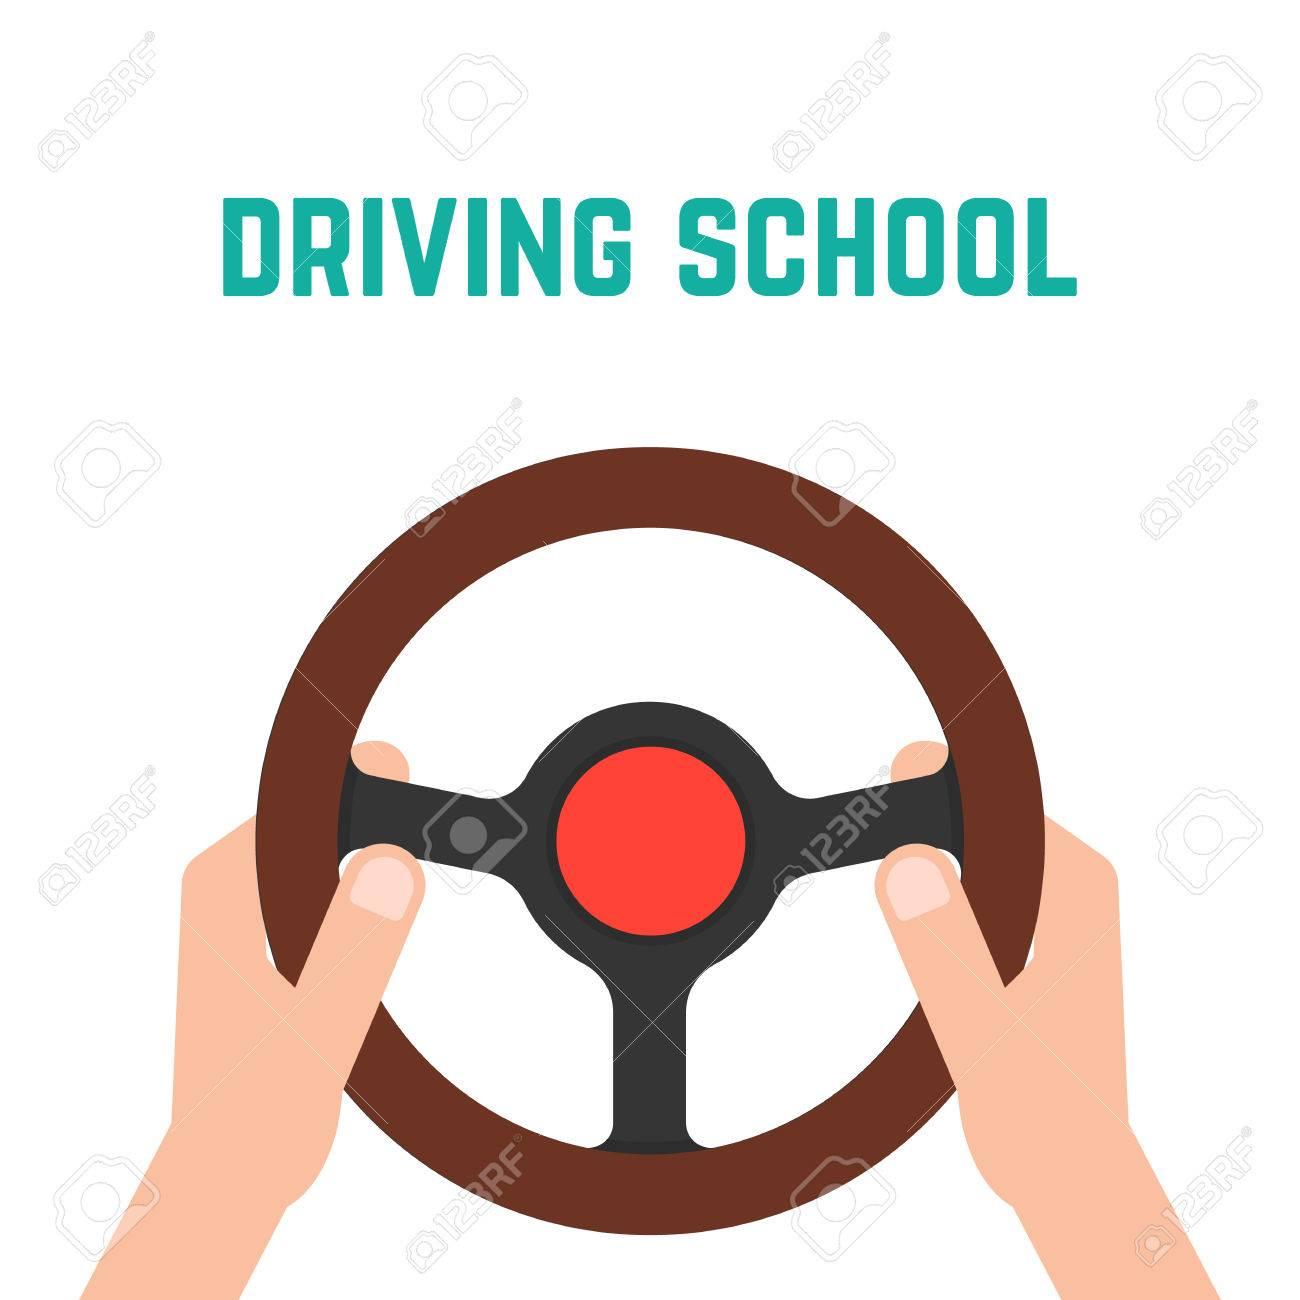 hand holding steering wheel. concept of trip, highway, guide, equipment, rudder, handlebar, training in driving school. - 53551923